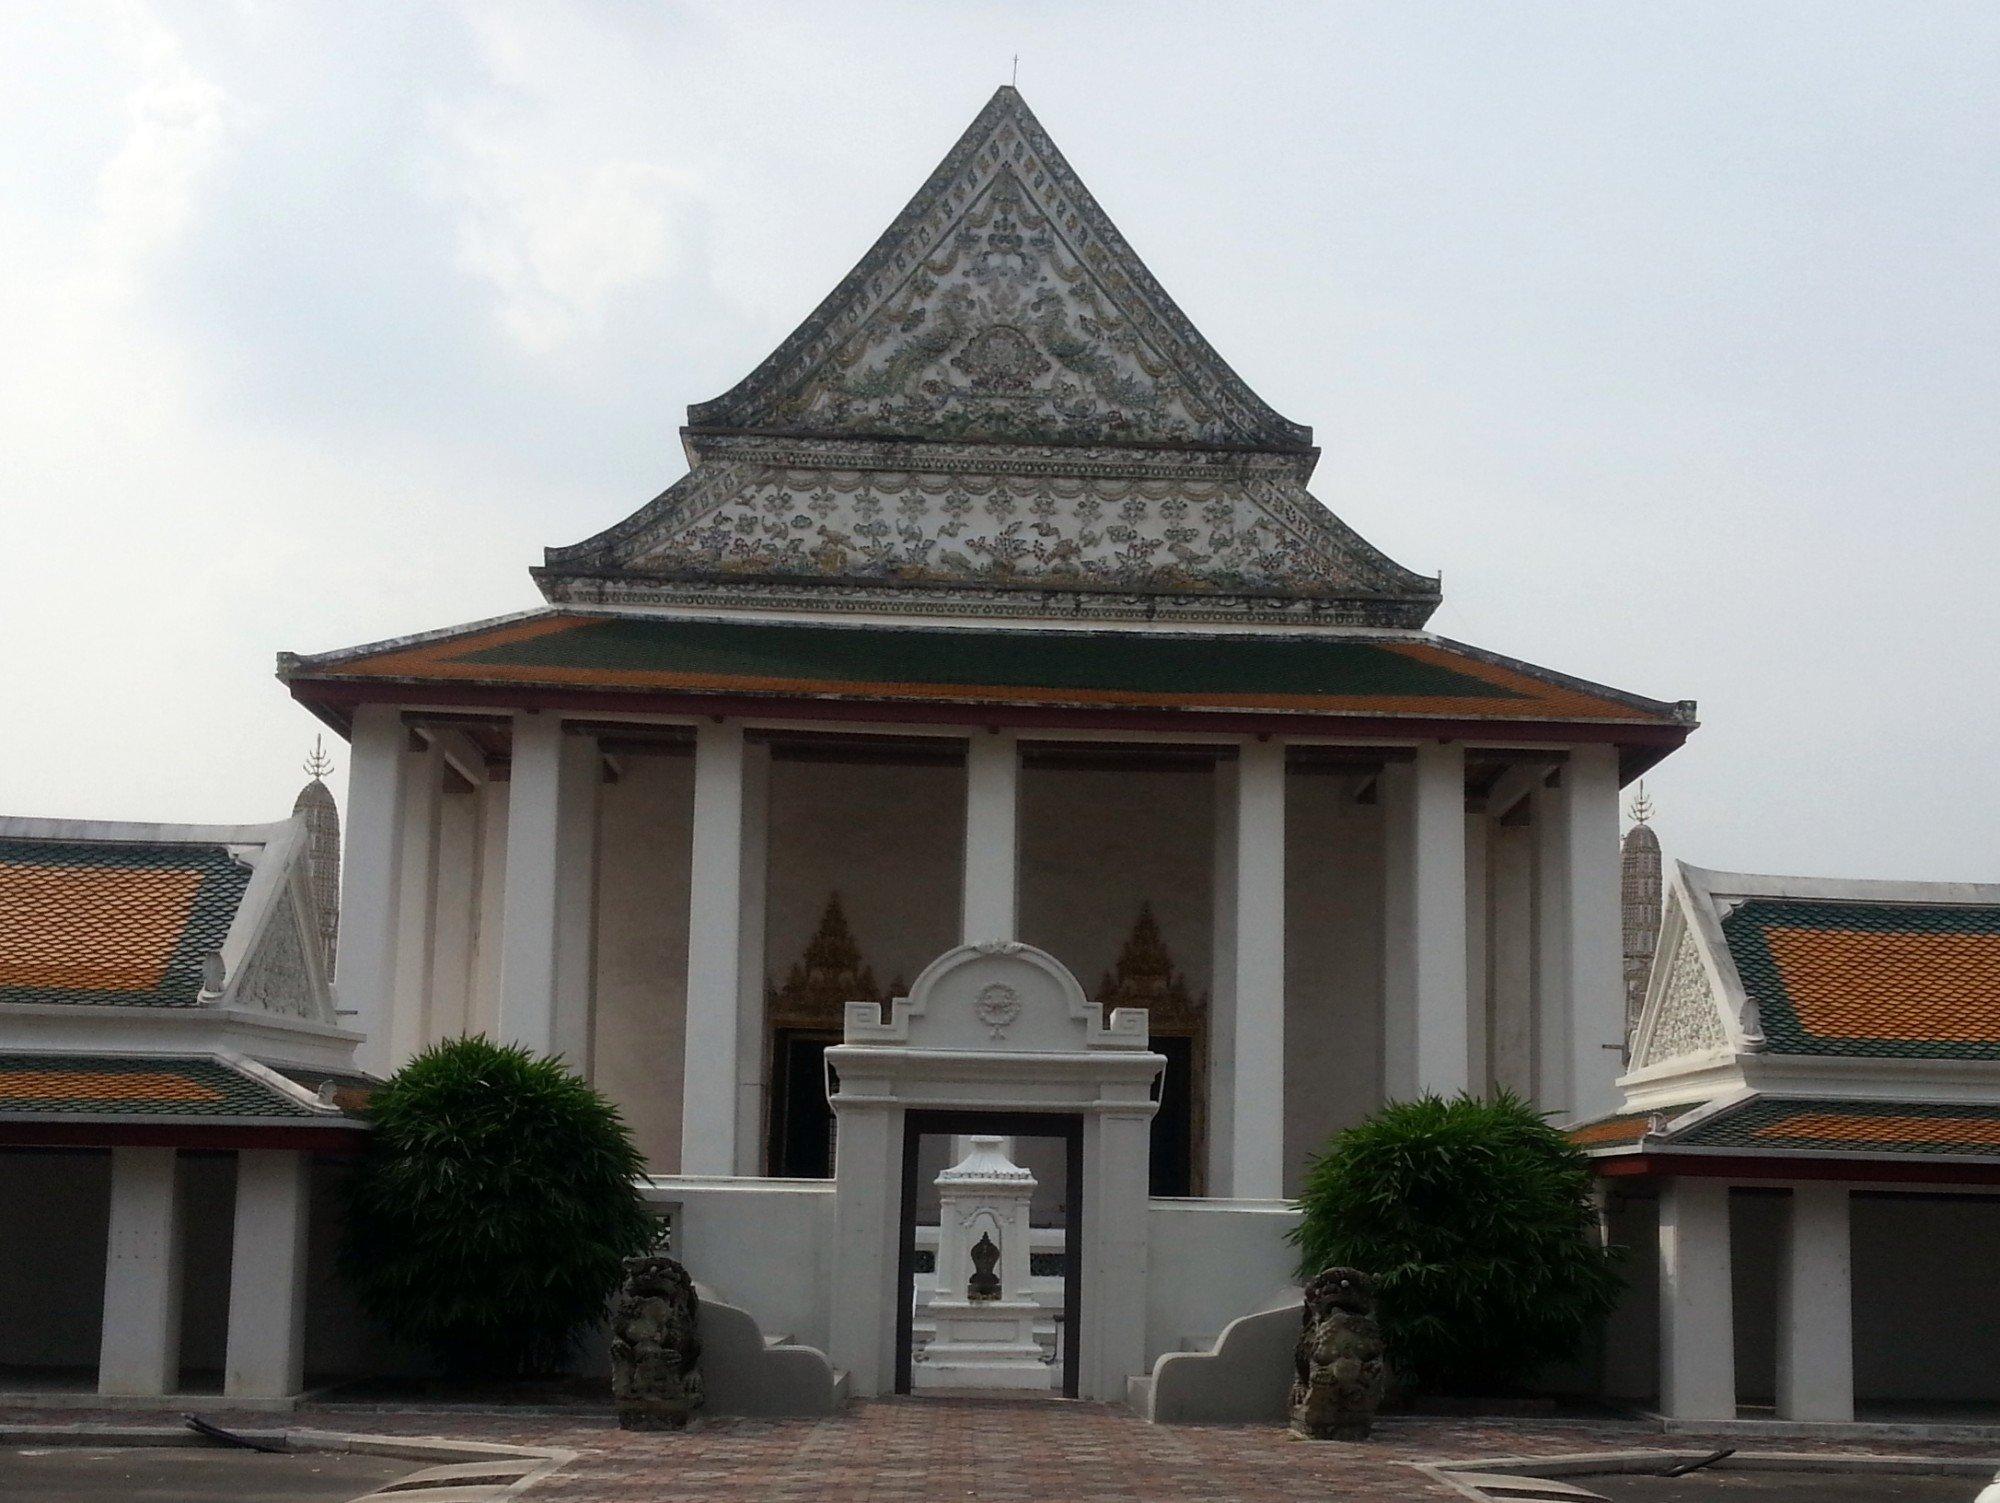 Ordination Hall at Wat Thepthidaram